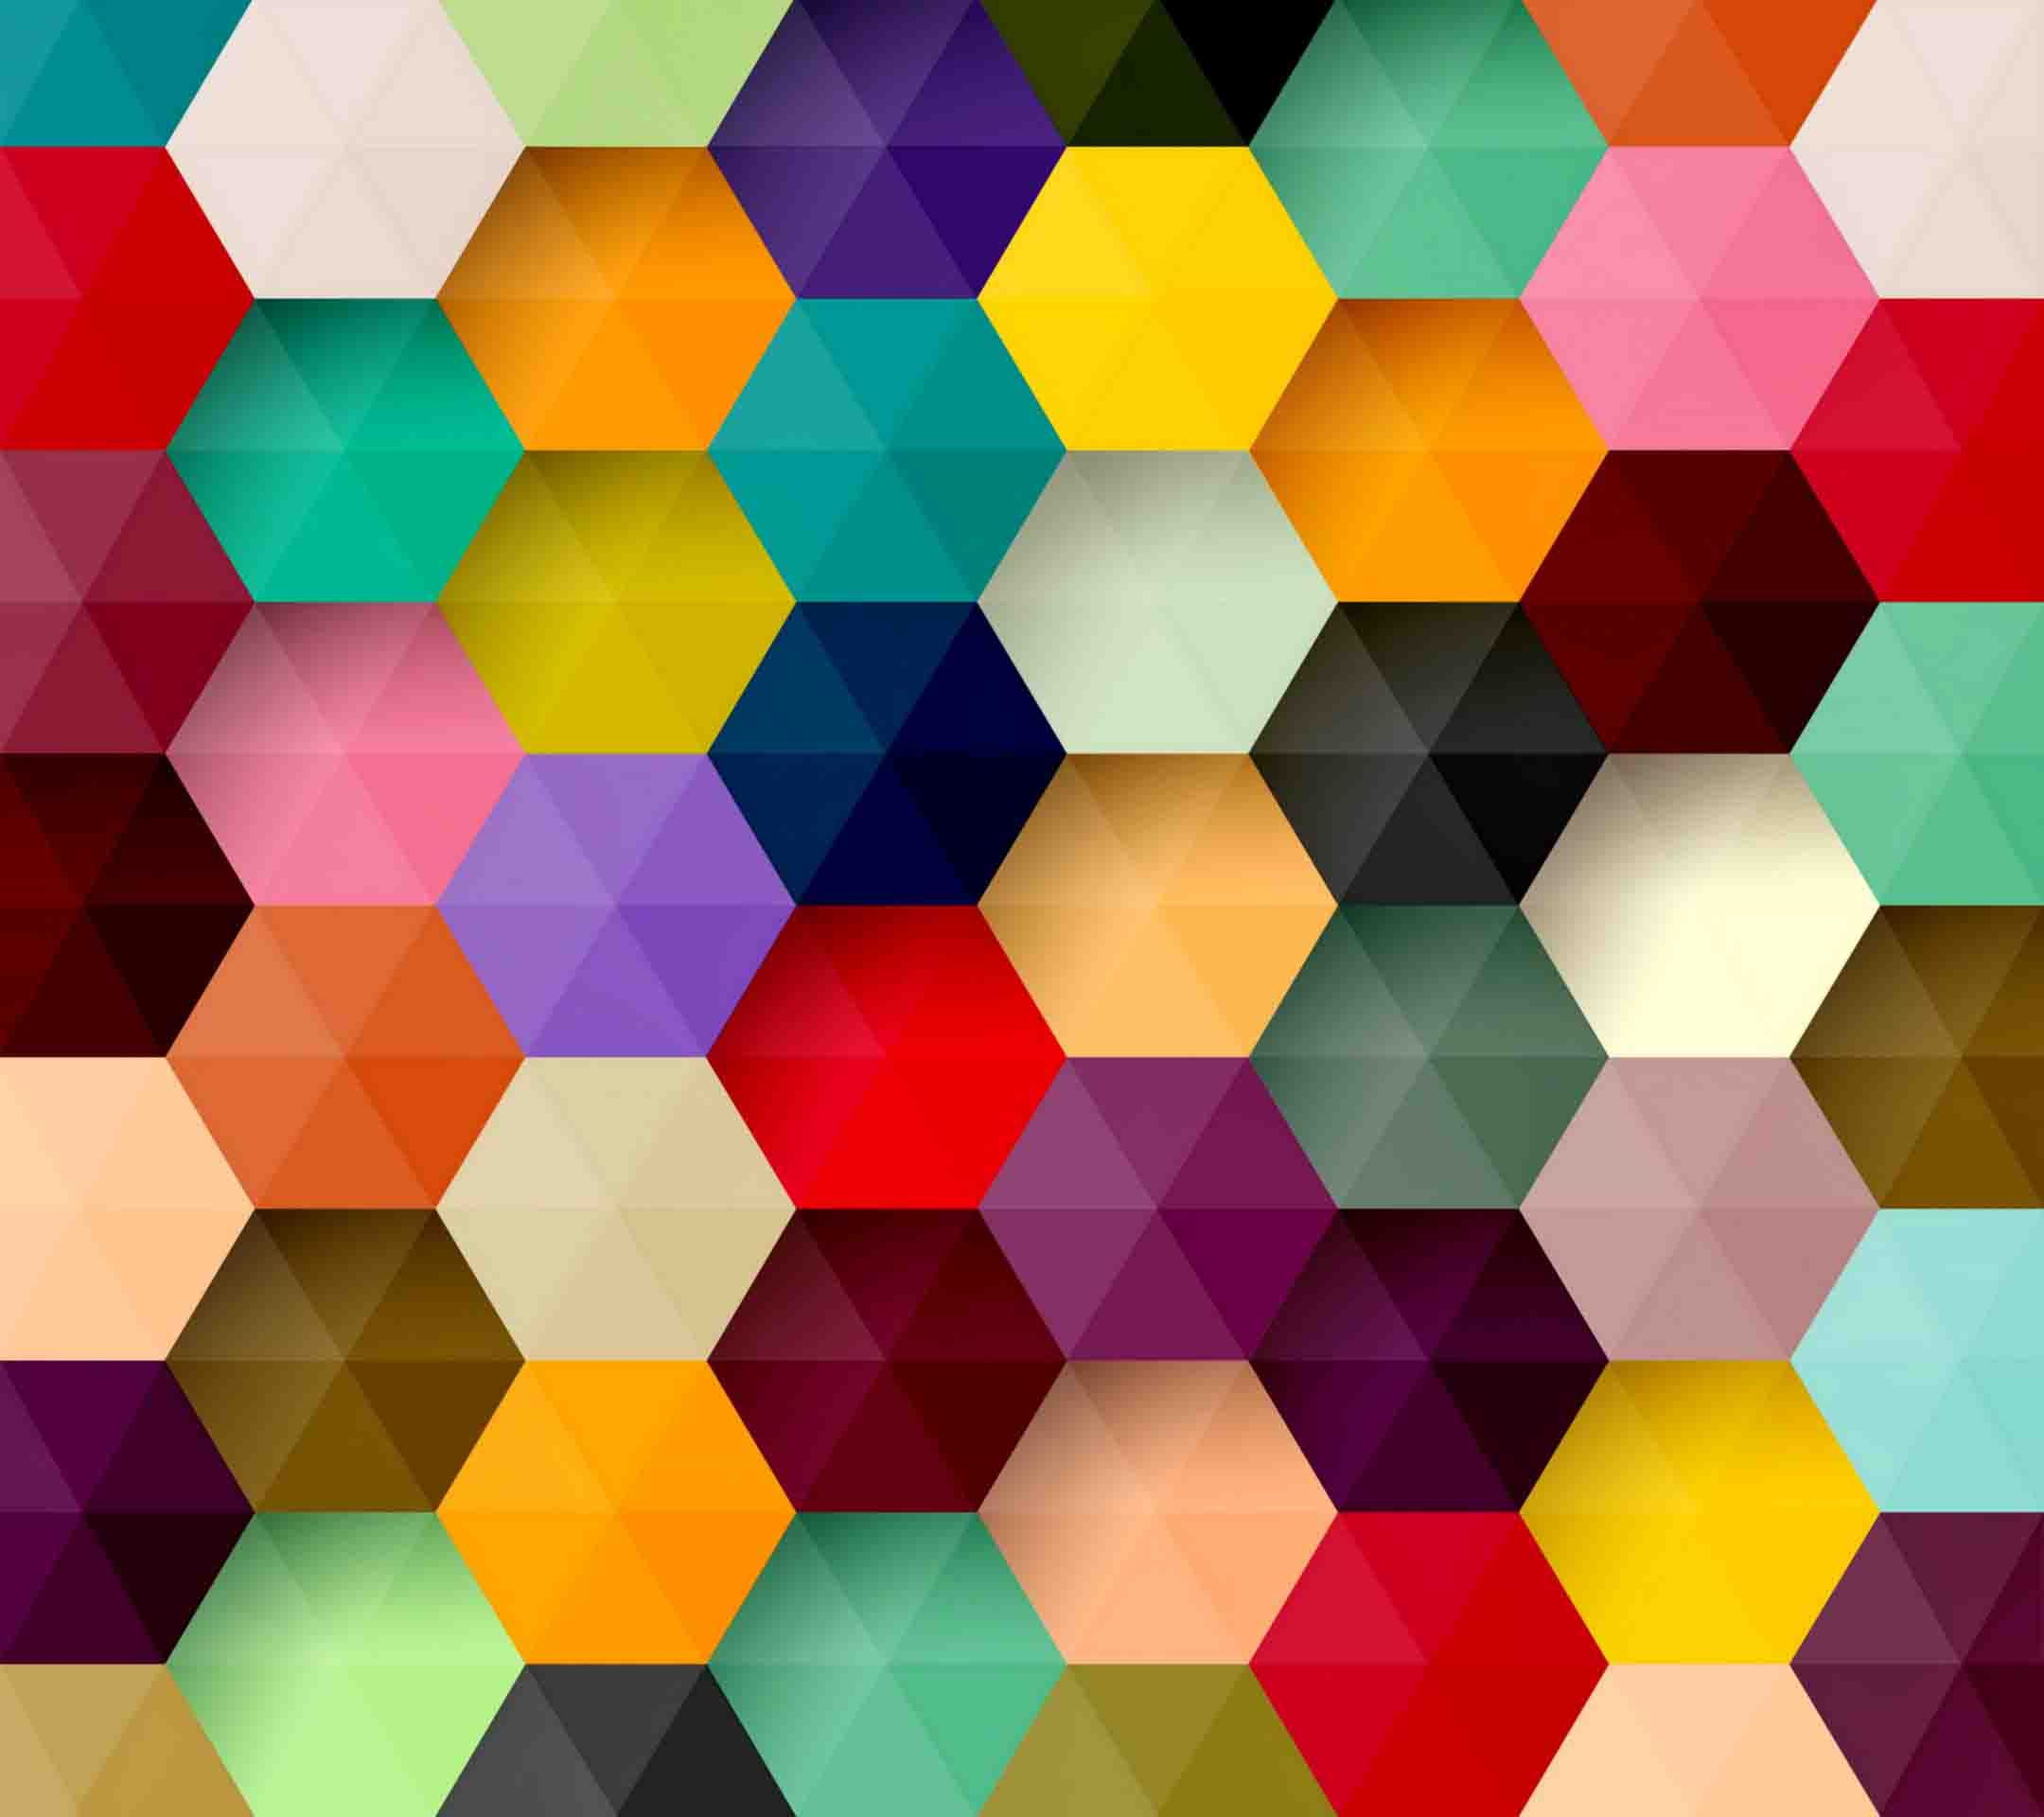 Free Colorful Geometric Wallpaper: Beautiful Geometric Wallpapers